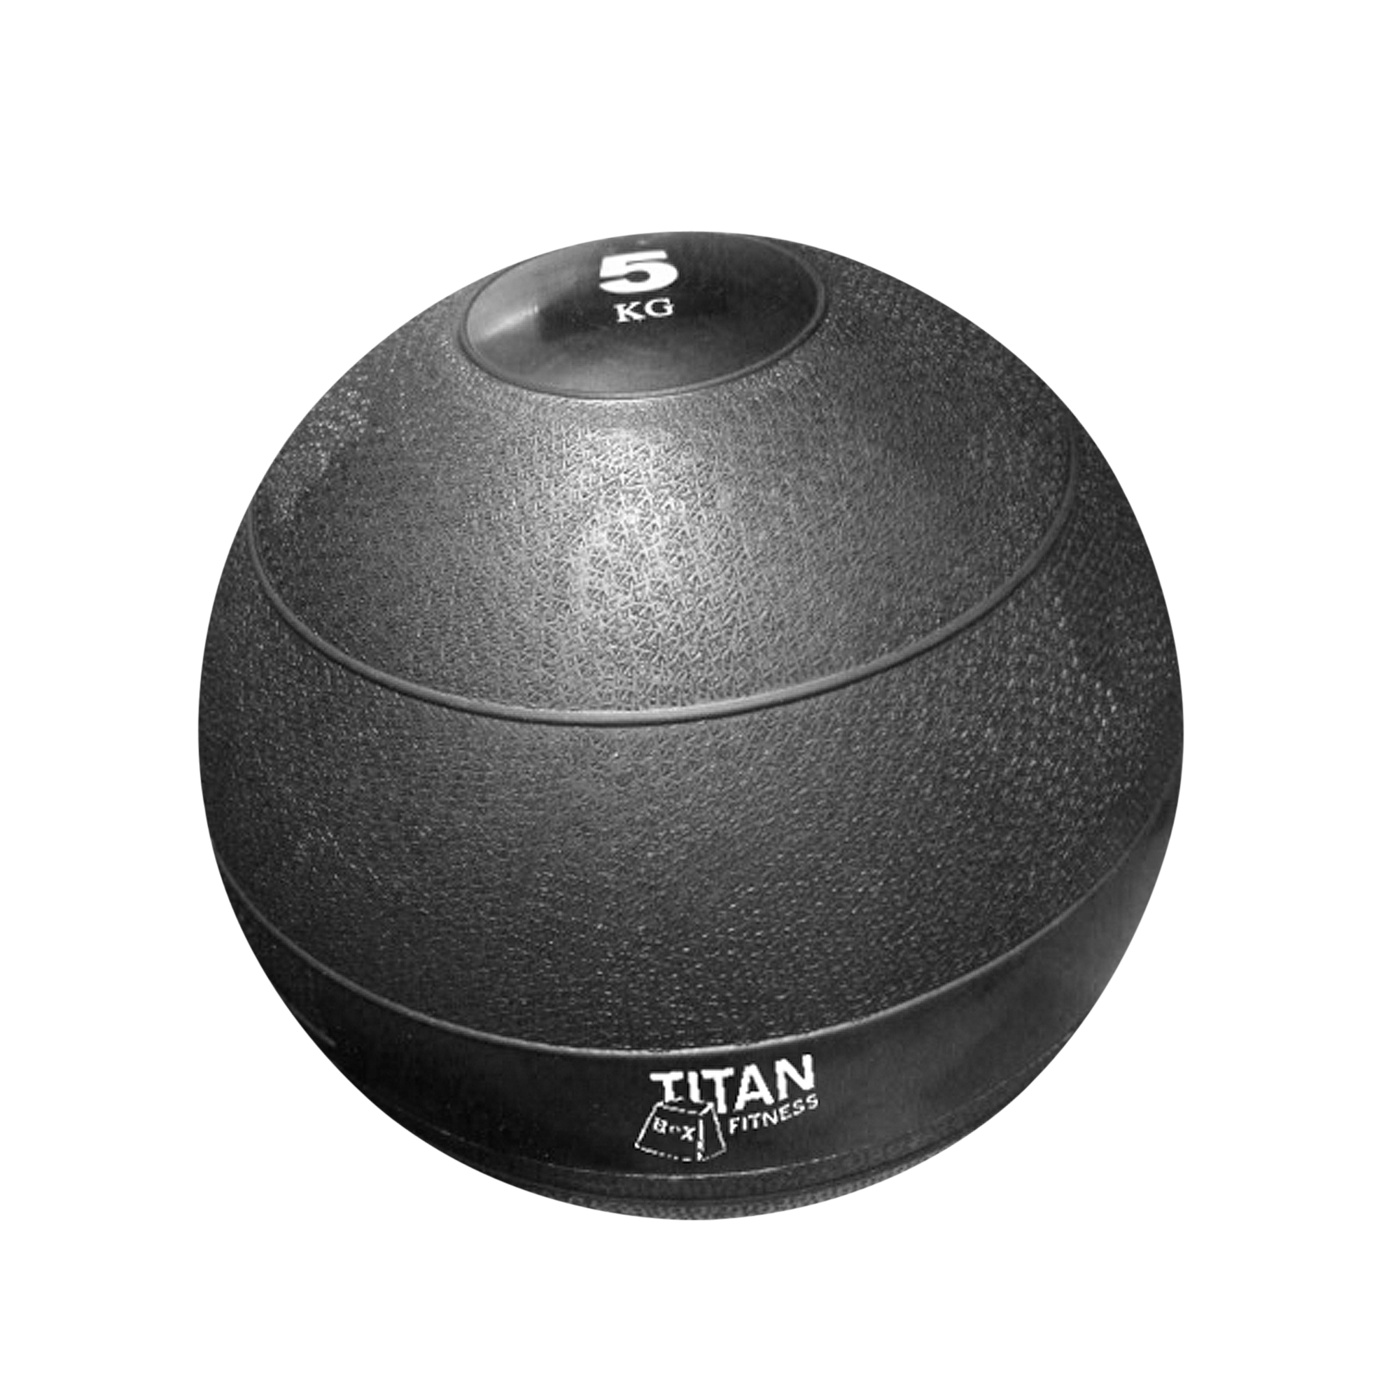 Titan_Box_Slammerball_5kg